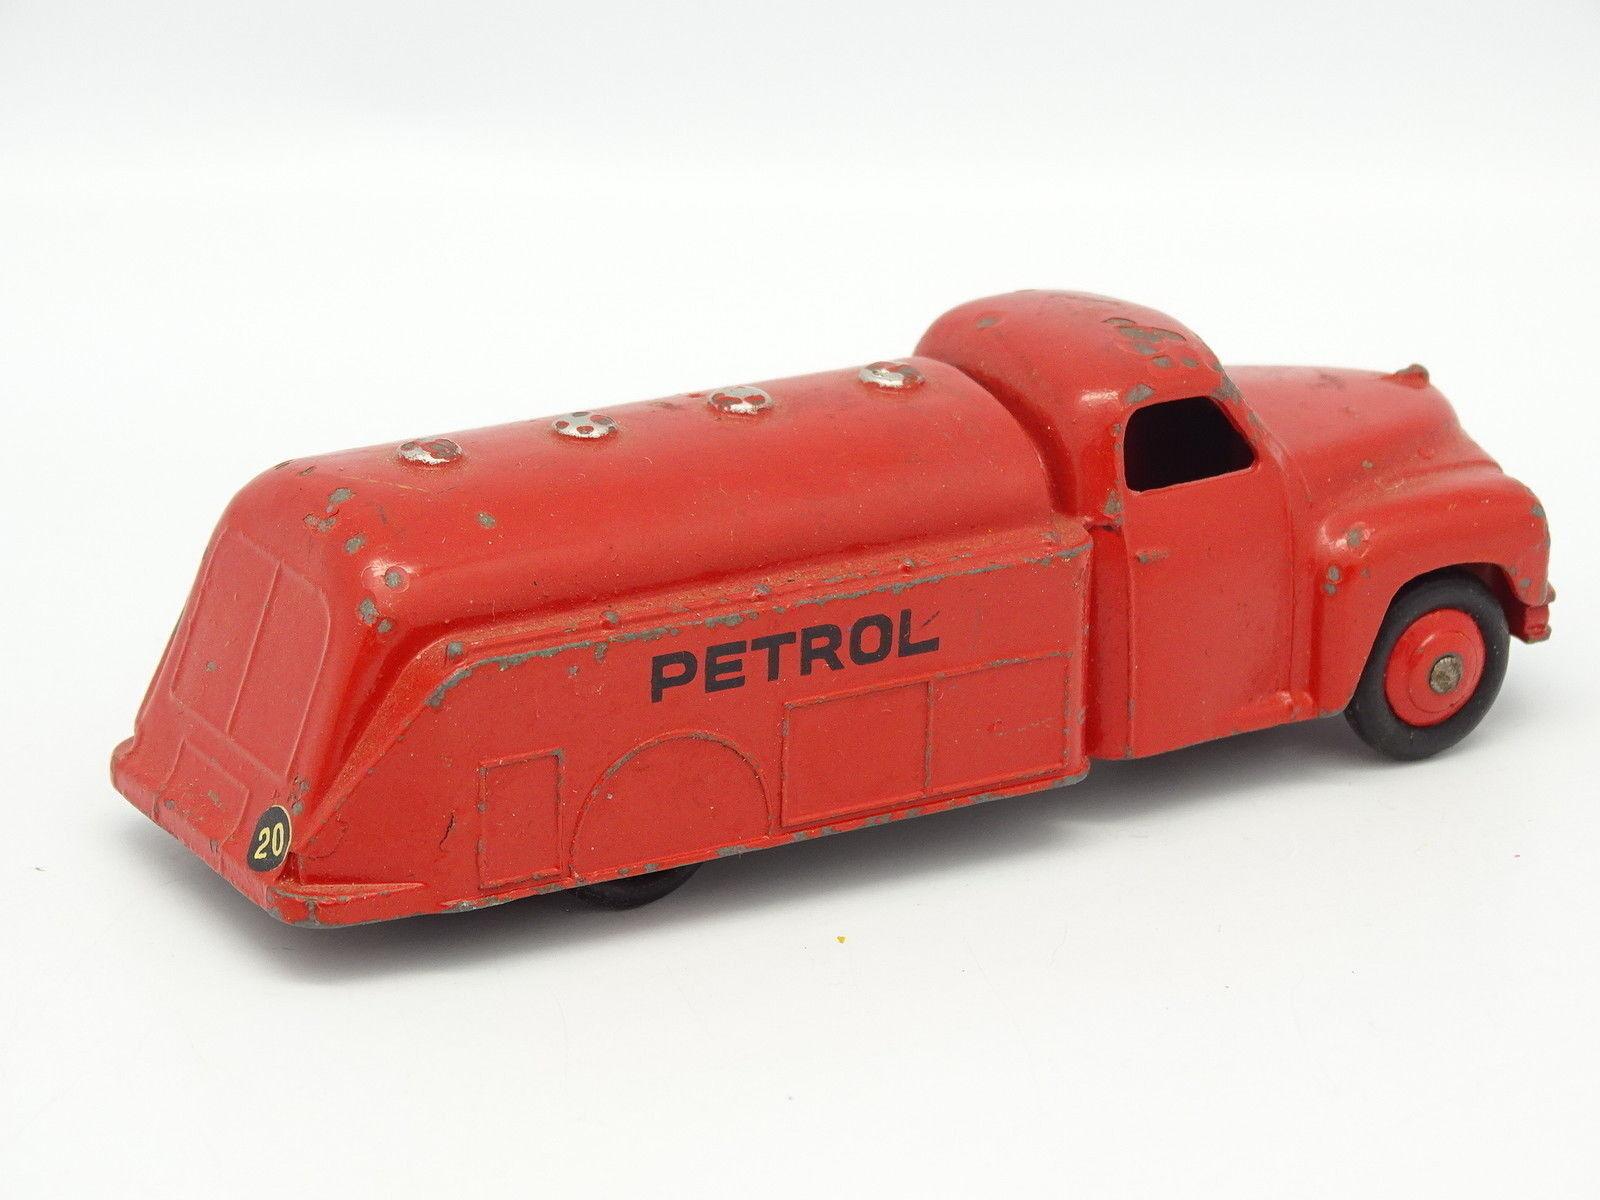 Dinky Toys GB SB 1 1 1 43 - Tanker Petrol Red 4c61a1